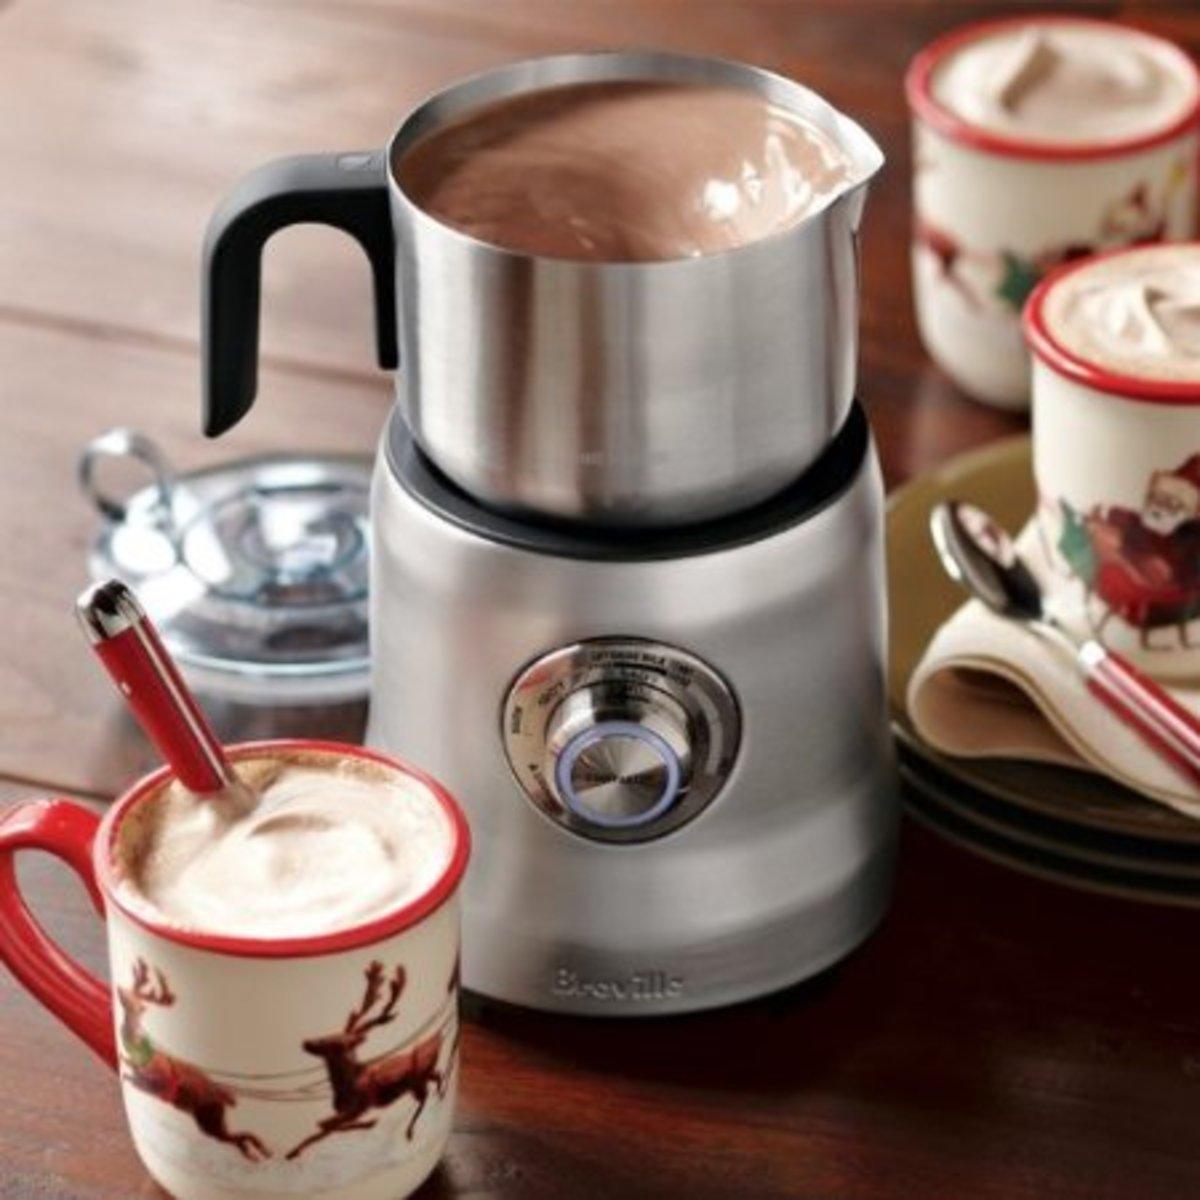 hot-chocolate-maker-2